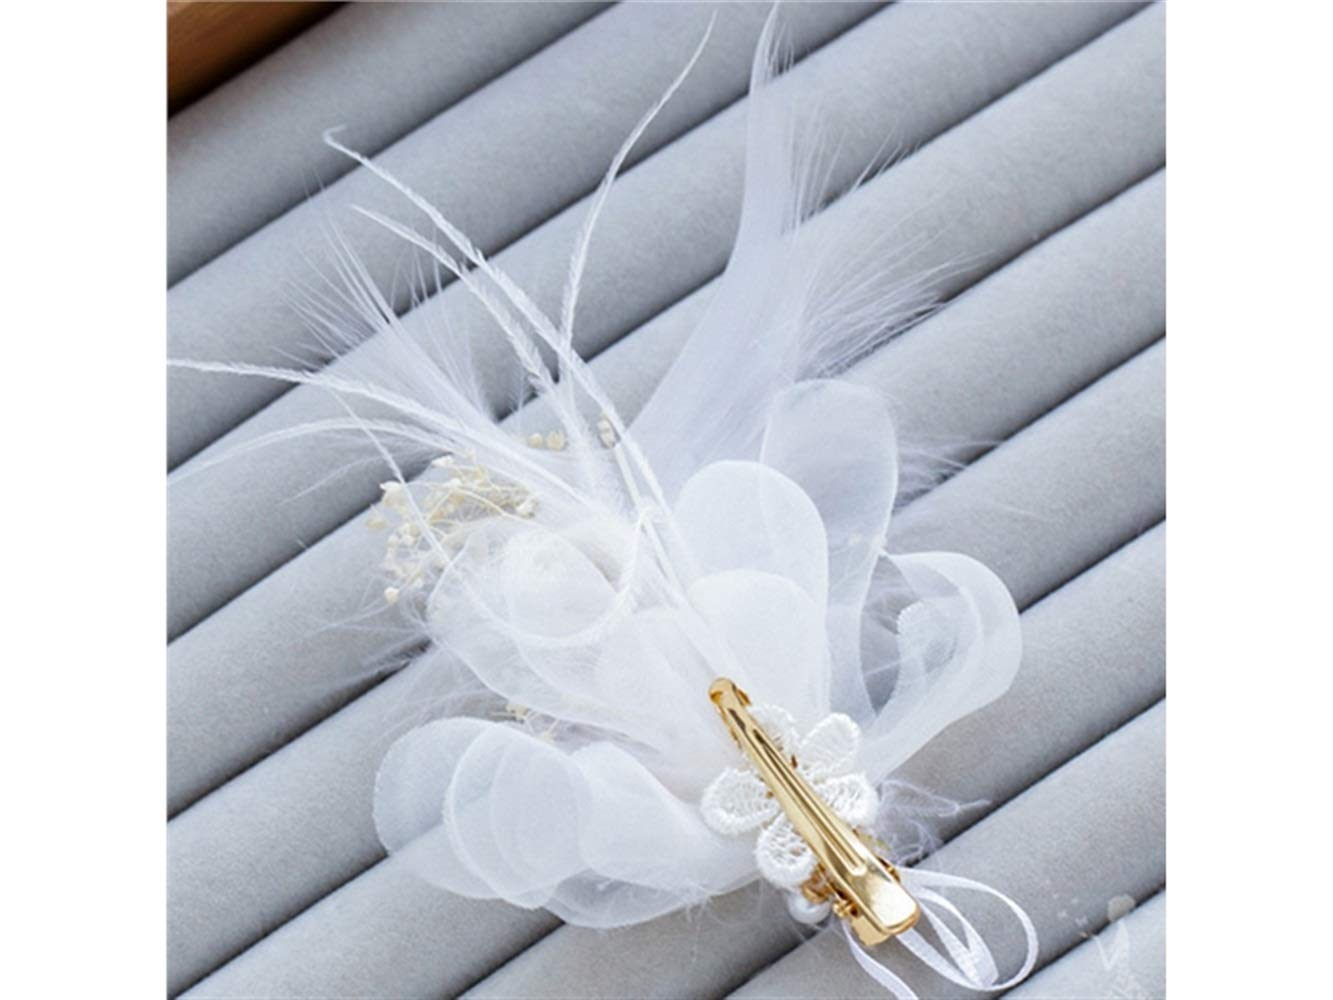 Horquilla Pluma Pinza de pelo perla horquilla Hilado Pinza de pelo Novia accesorios para el cabello boda horquilla (blanco) Peluquería GYPO